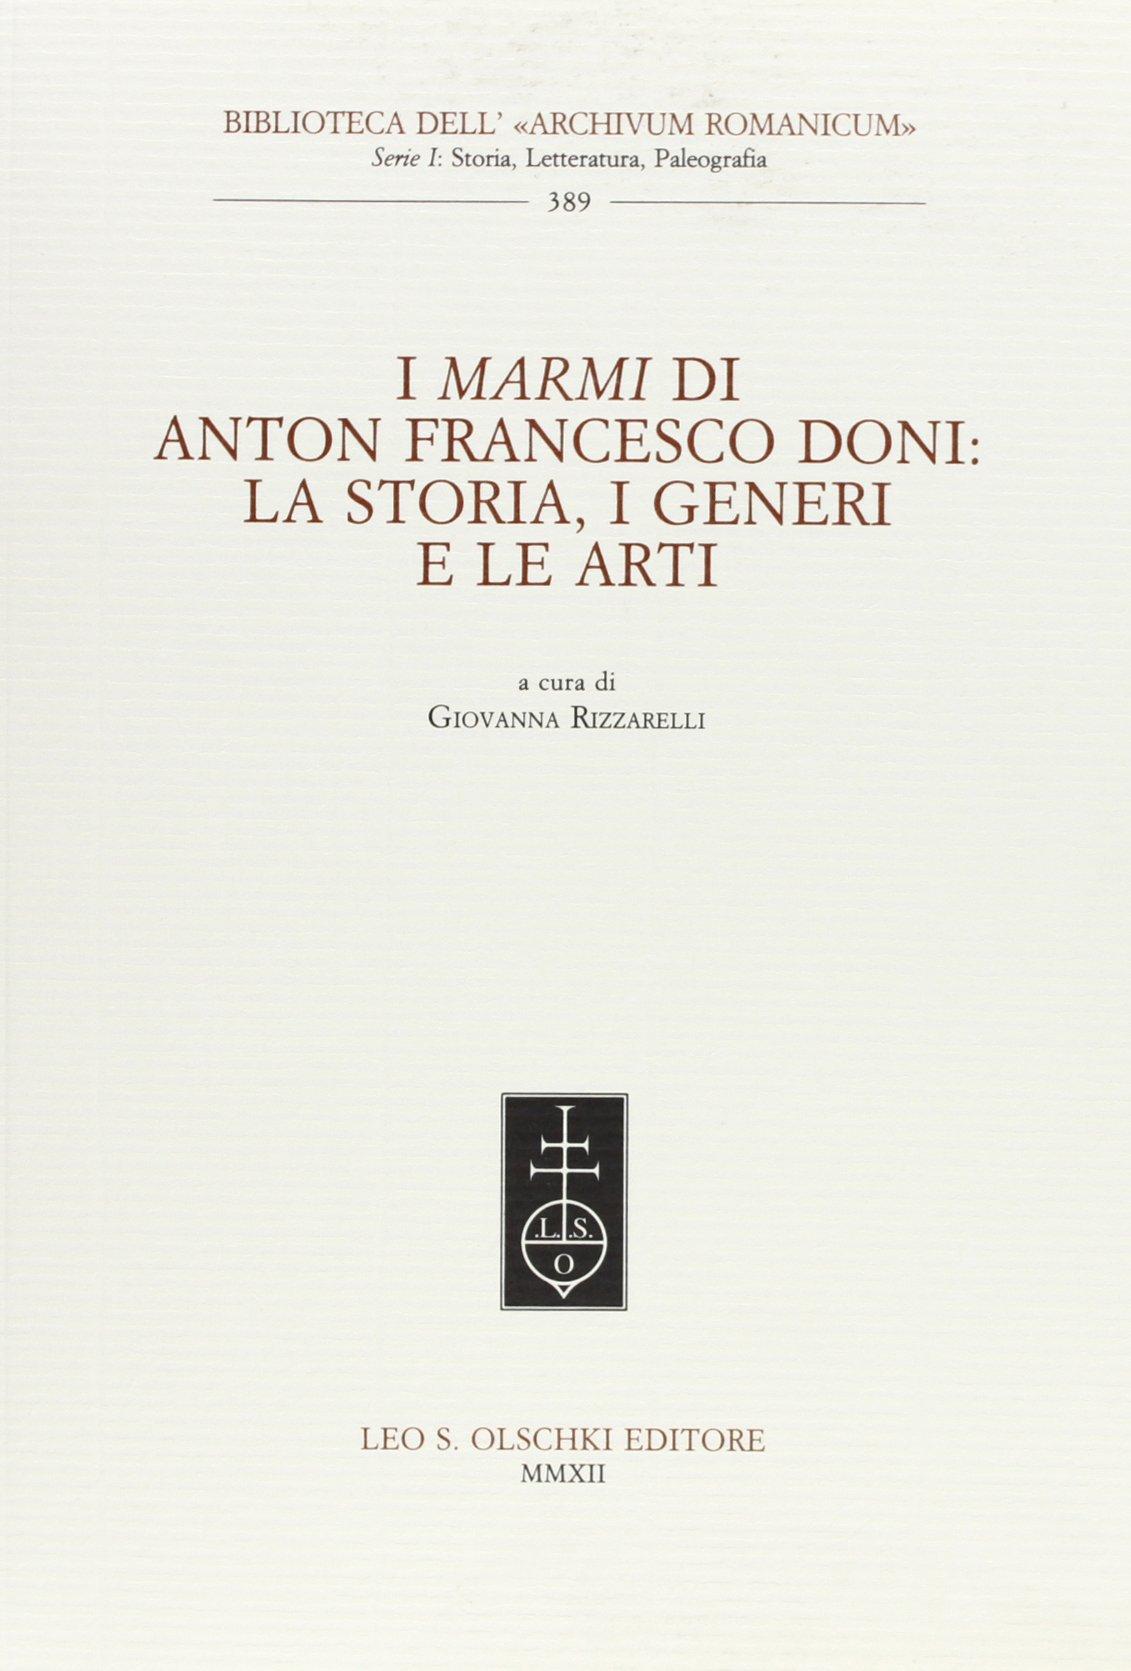 Anton Francesco Doni I Marmi